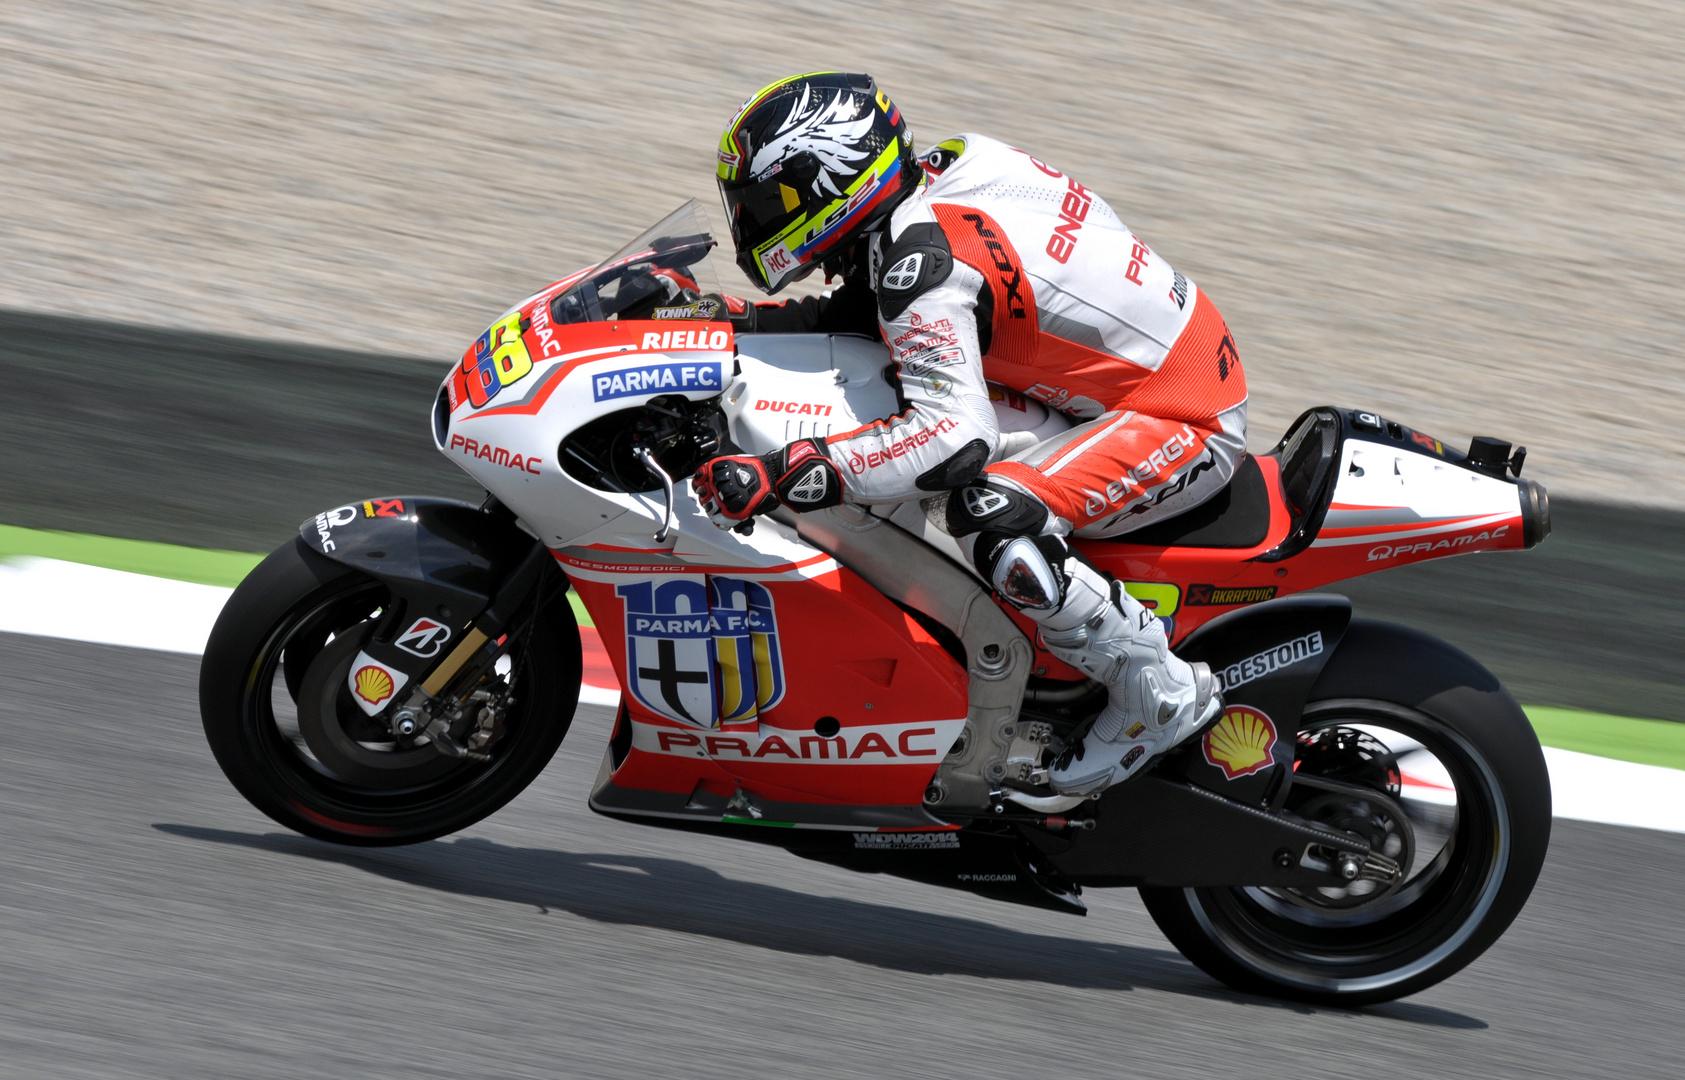 Yonny Hernandez auf der Pramac Ducati